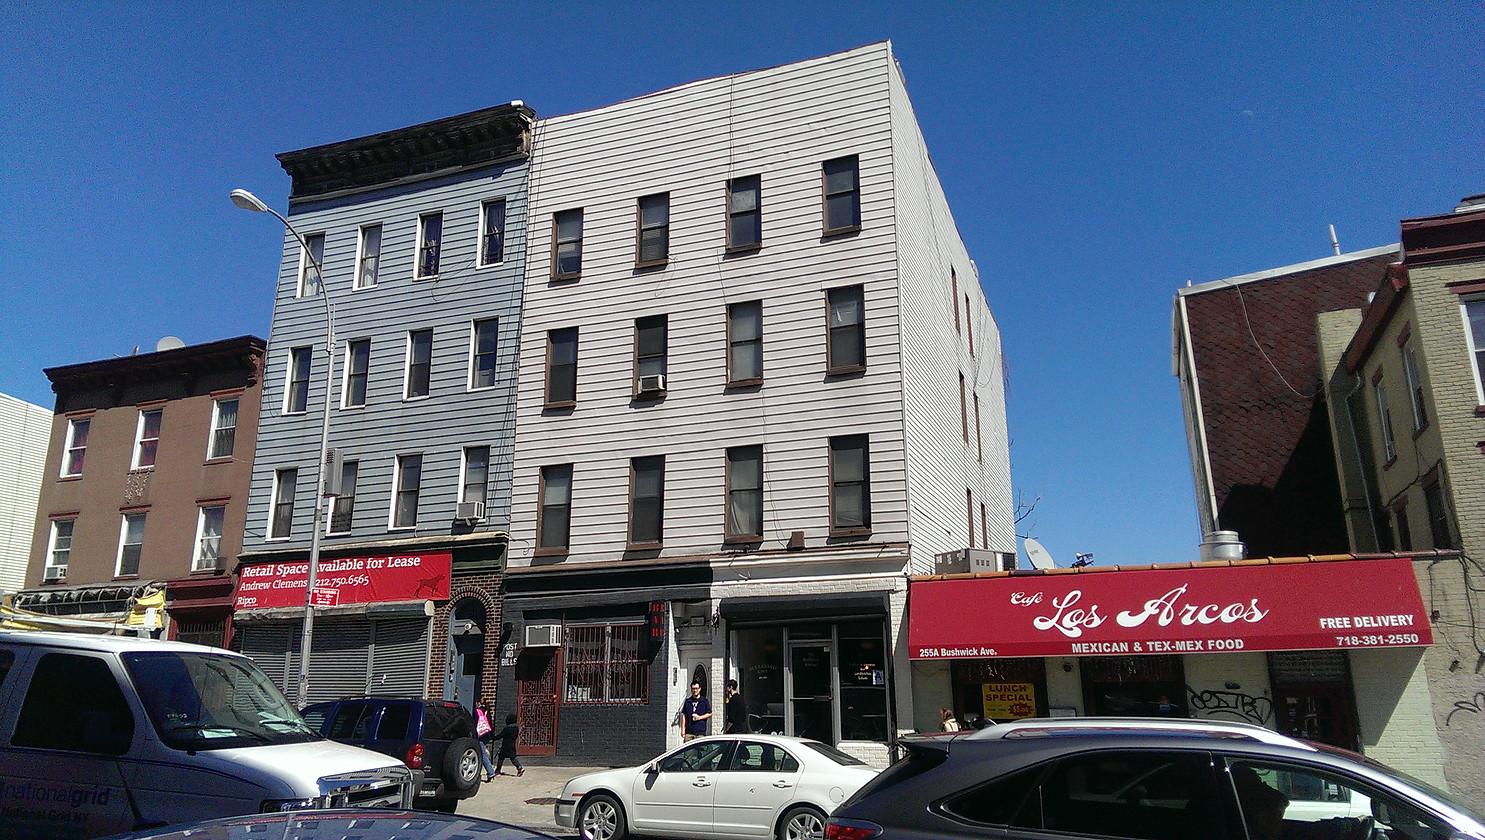 East Williamsburg, Brooklyn